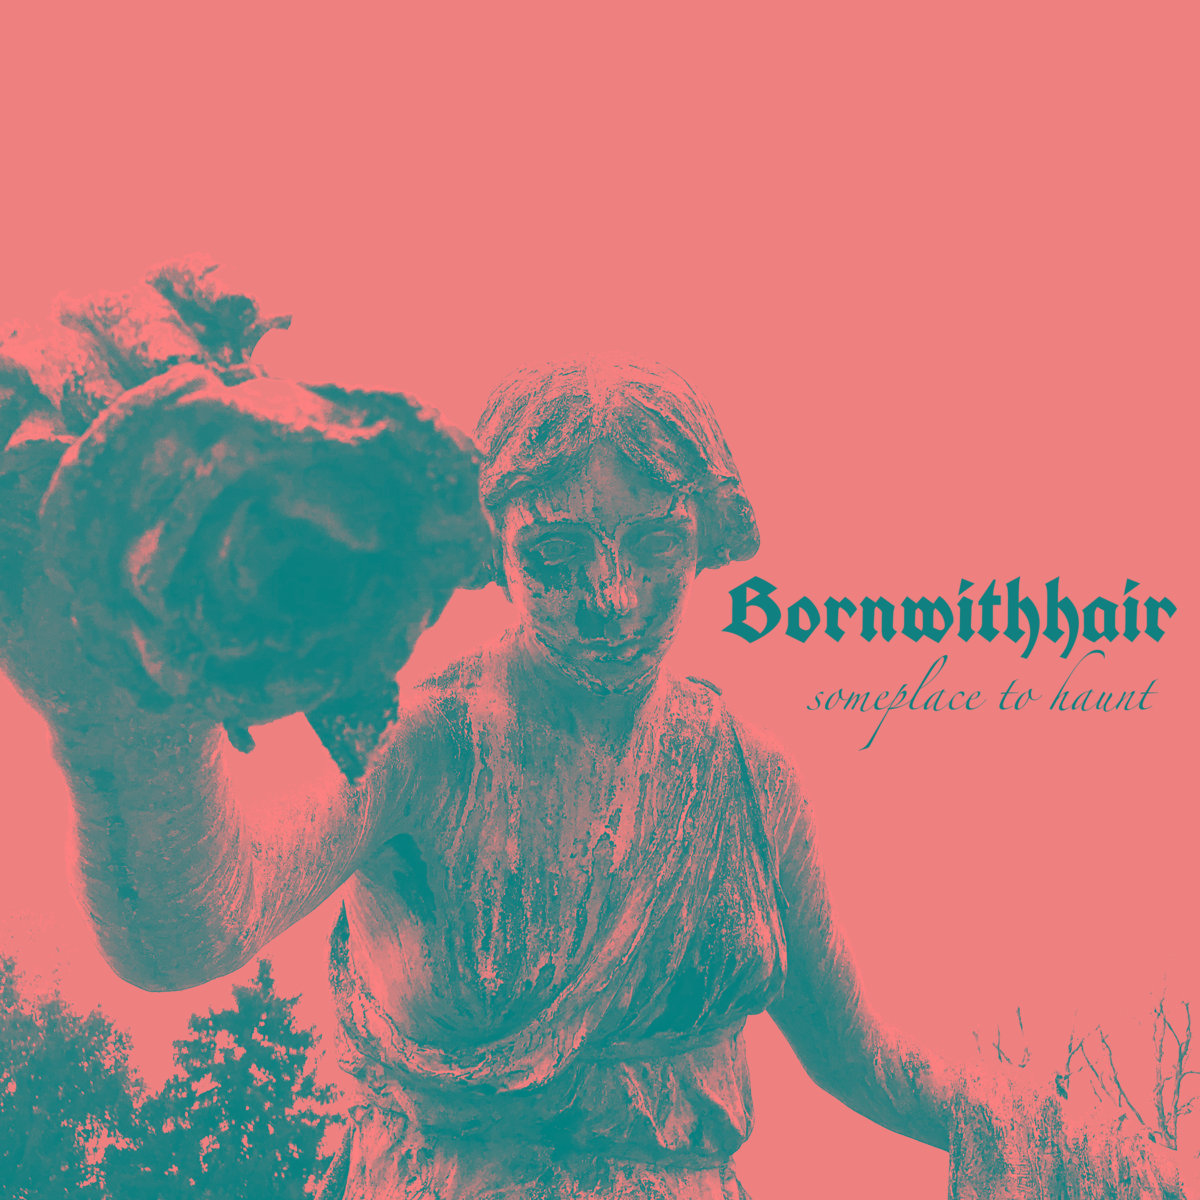 Bornwithhair